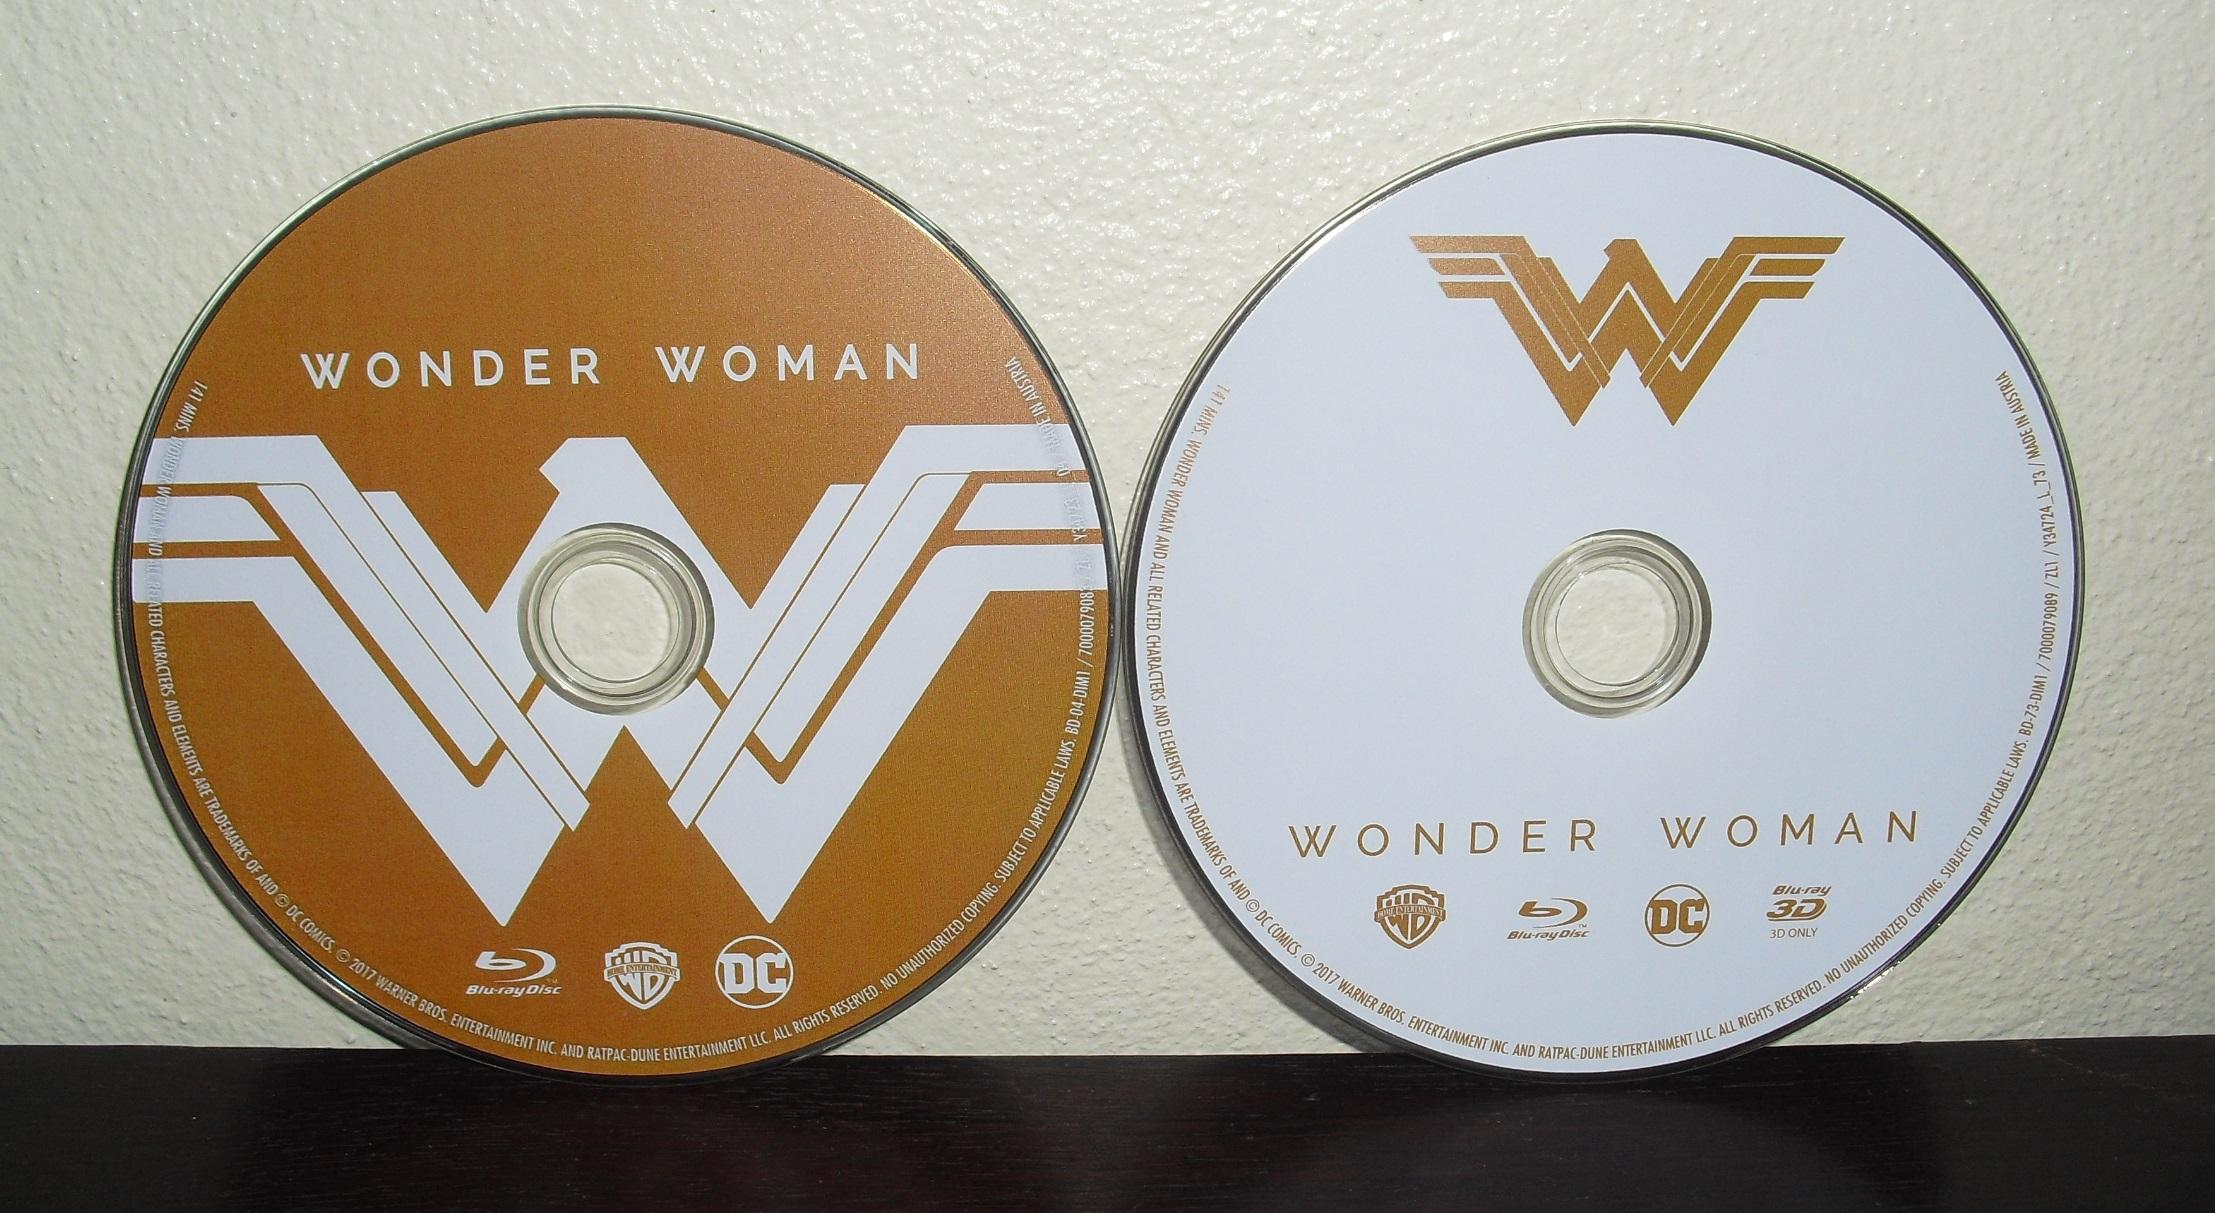 https://cld.pt/dl/download/76b222ec-767f-4d91-8a53-d656fb5958f2/Wonder.Woman.Interior.2.JPG